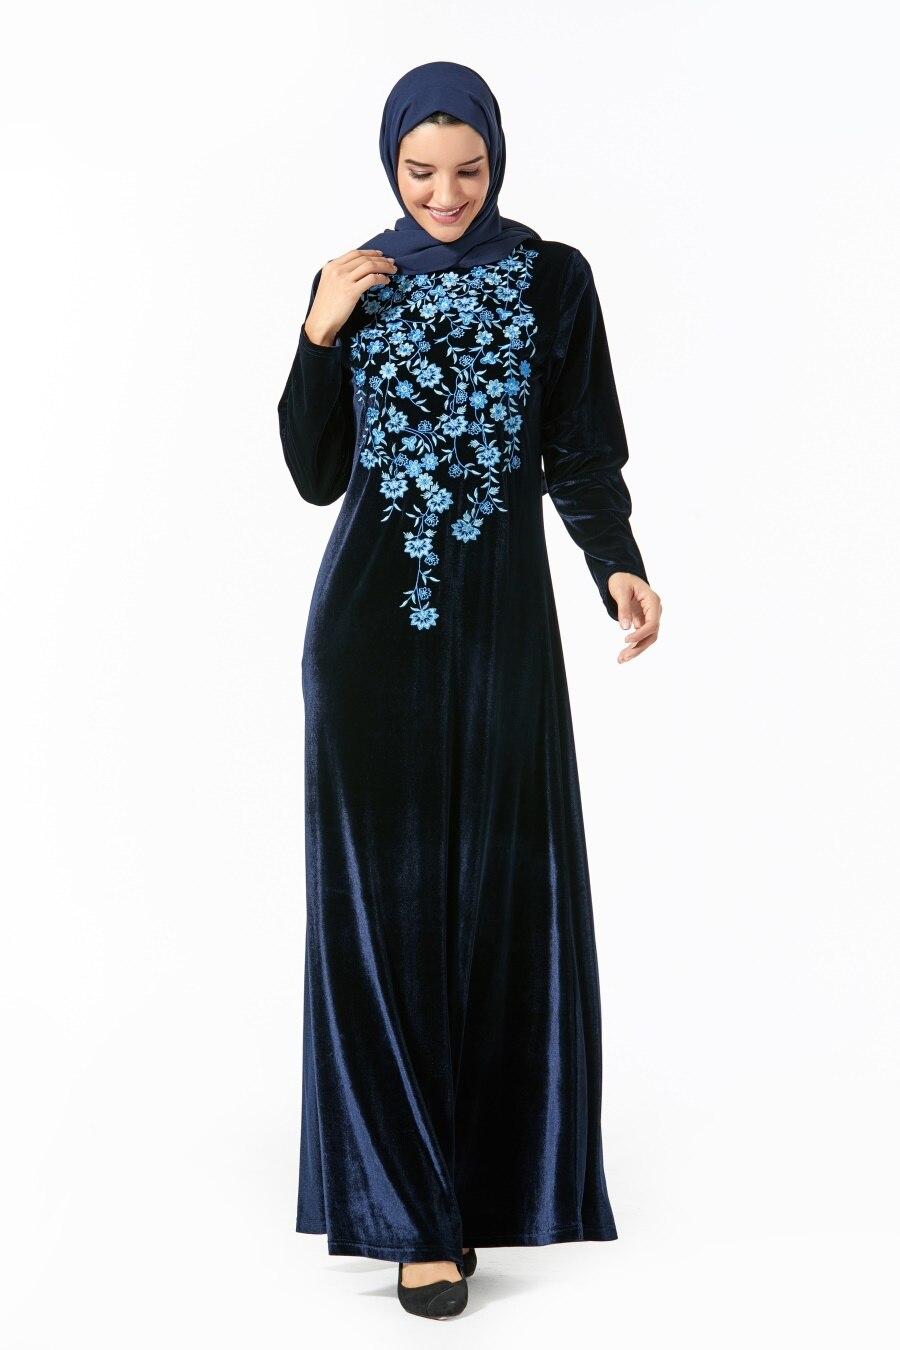 Siskakia Plus Size Chic Floral Embroidery Maxi Dresses Elegant O Neck Long Sleeve Swing Arabian Clothes Navy Blue Winter 2019 Dresses Aliexpress